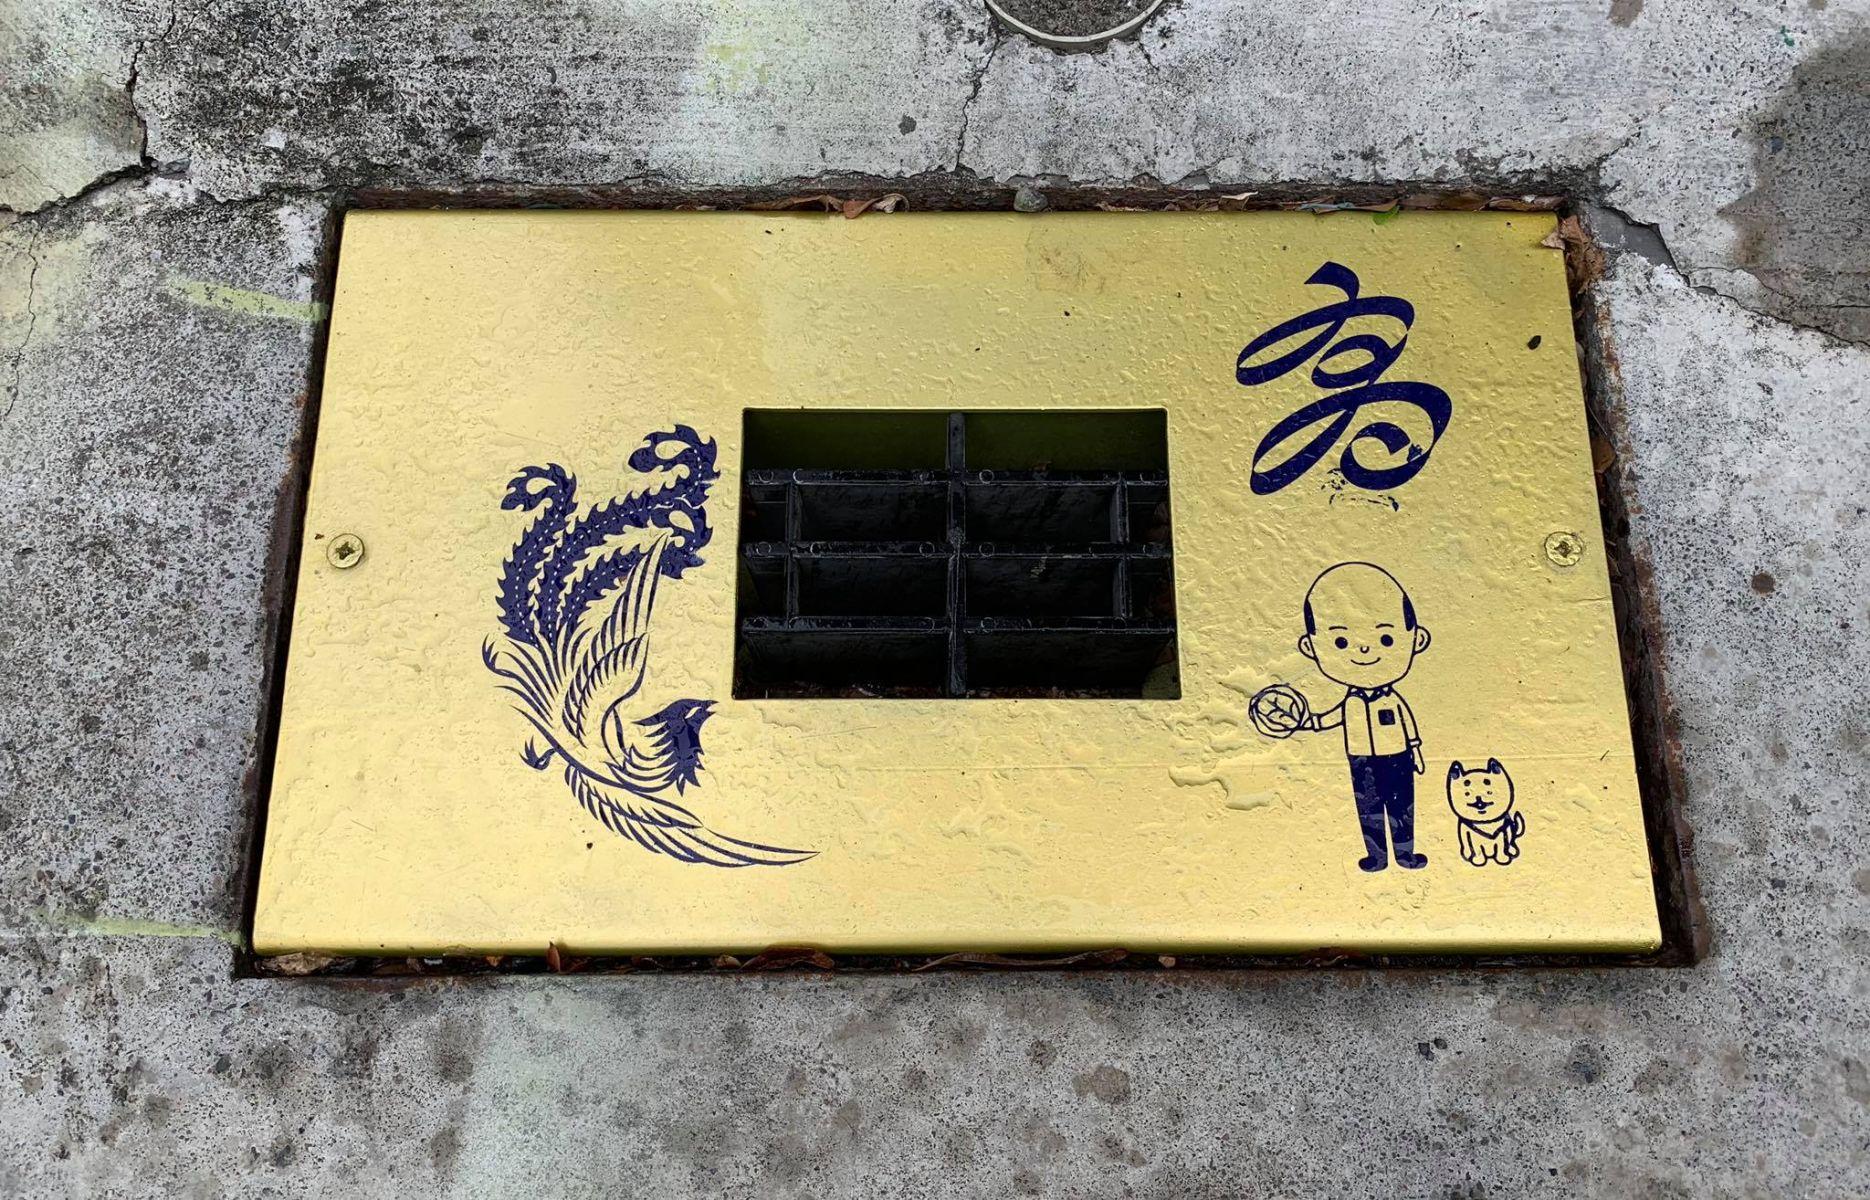 「高雄點Kaohsiung.」臉書 金色排水孔蓋引發關注